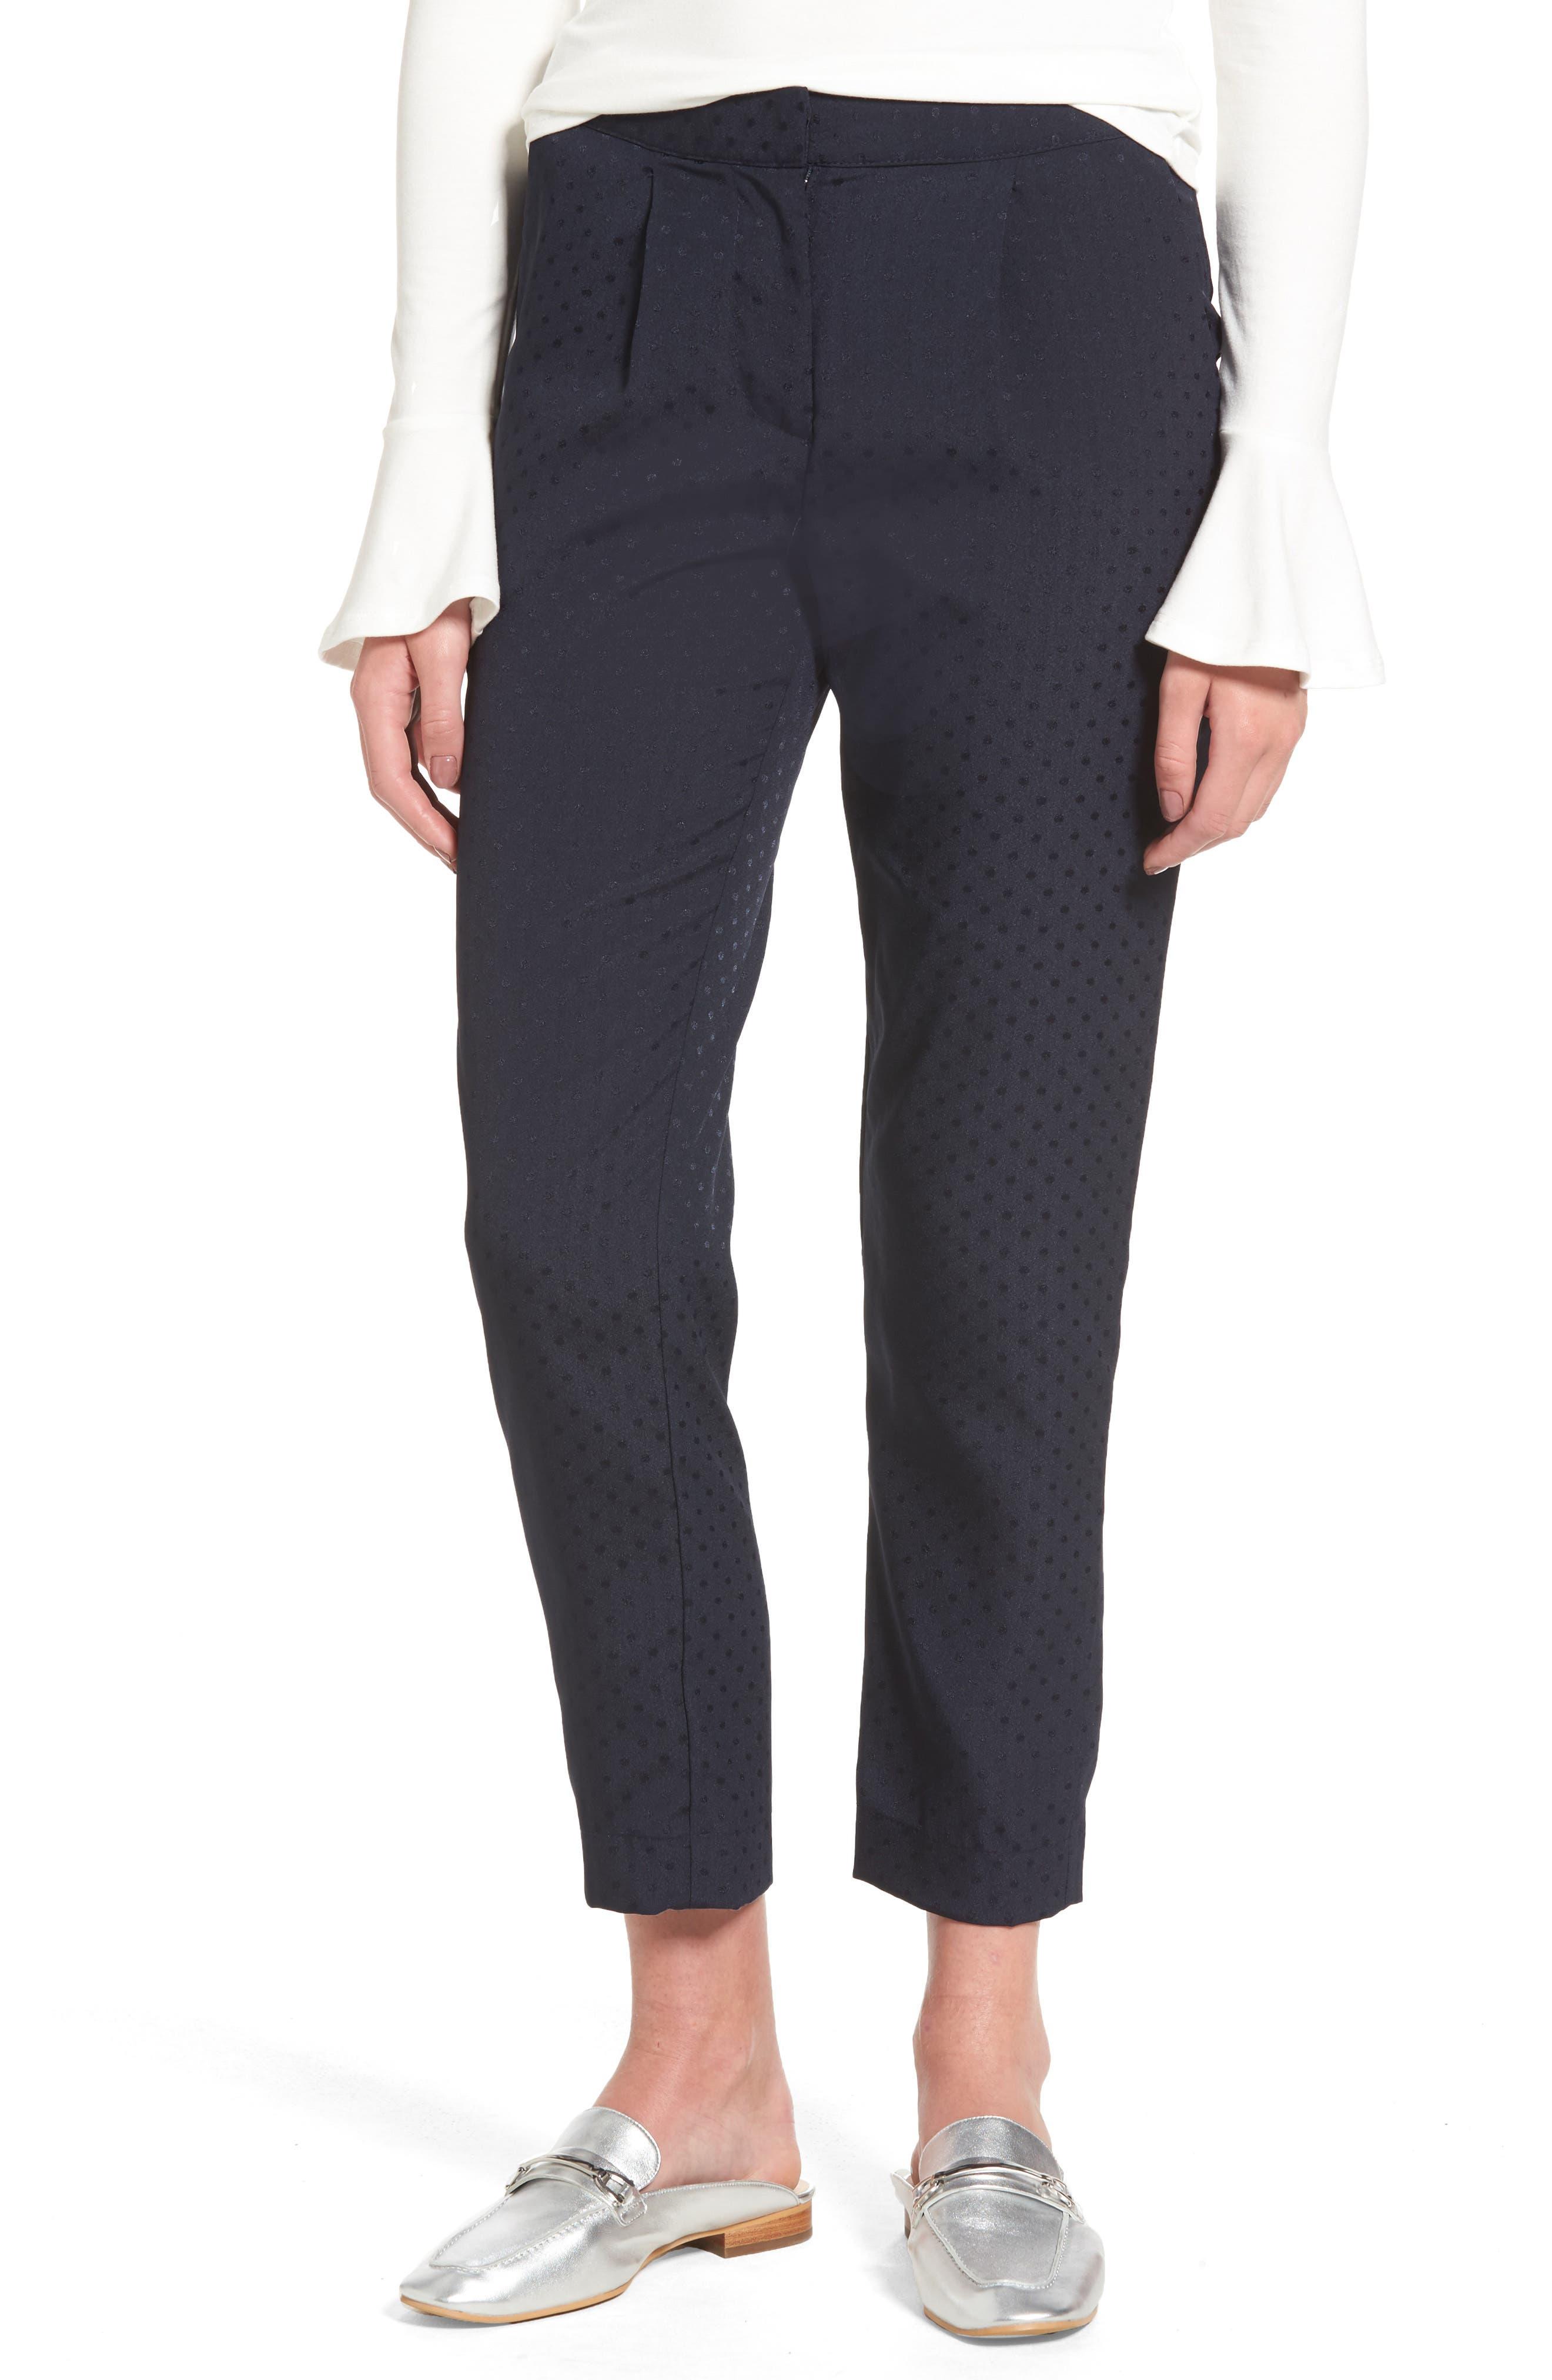 Main Image - Willow & Clay Tonal Dot Slim Pants